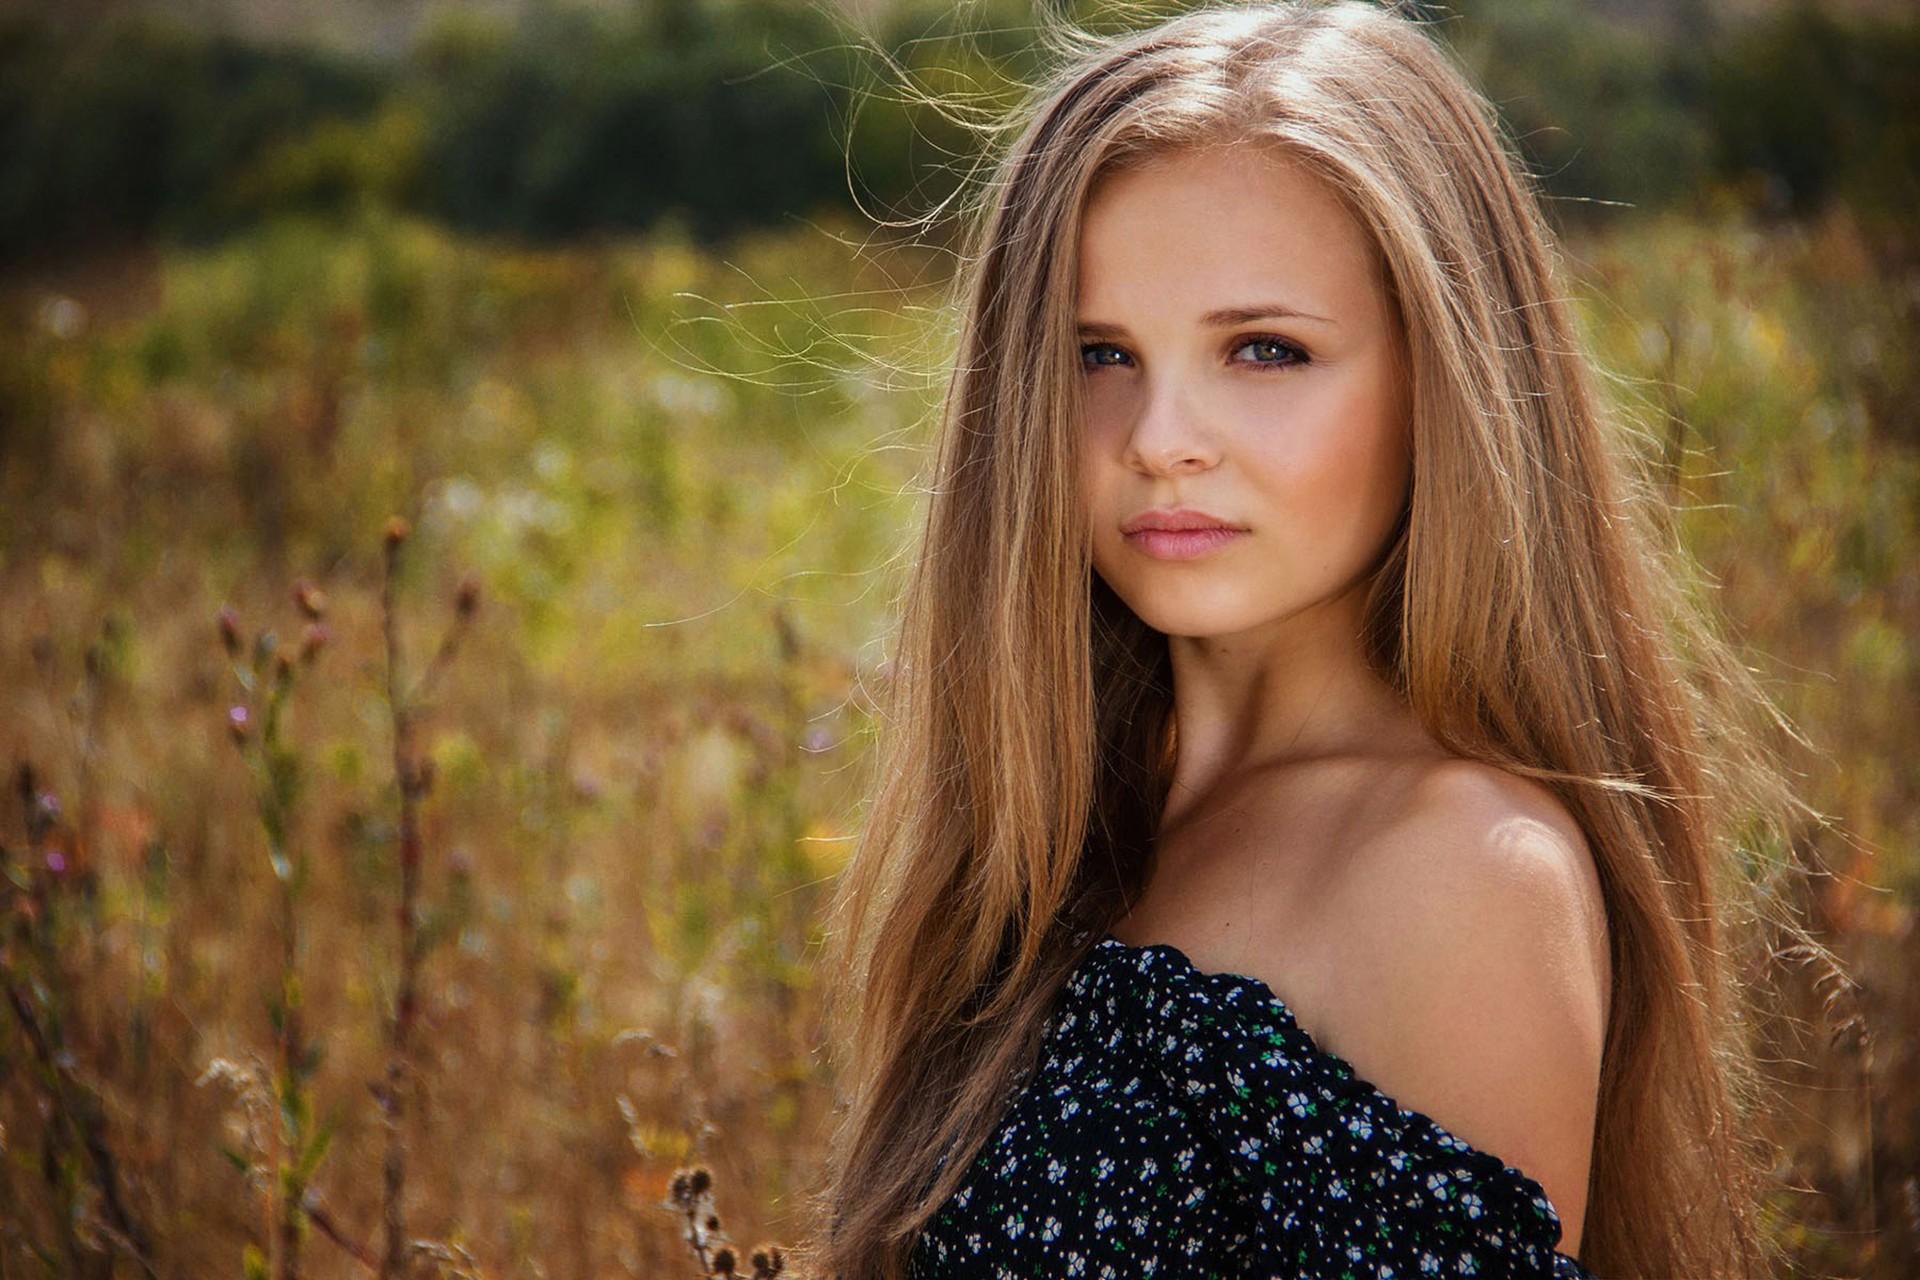 girl-teen-age-girls-in-russia-vibrator-masturbation